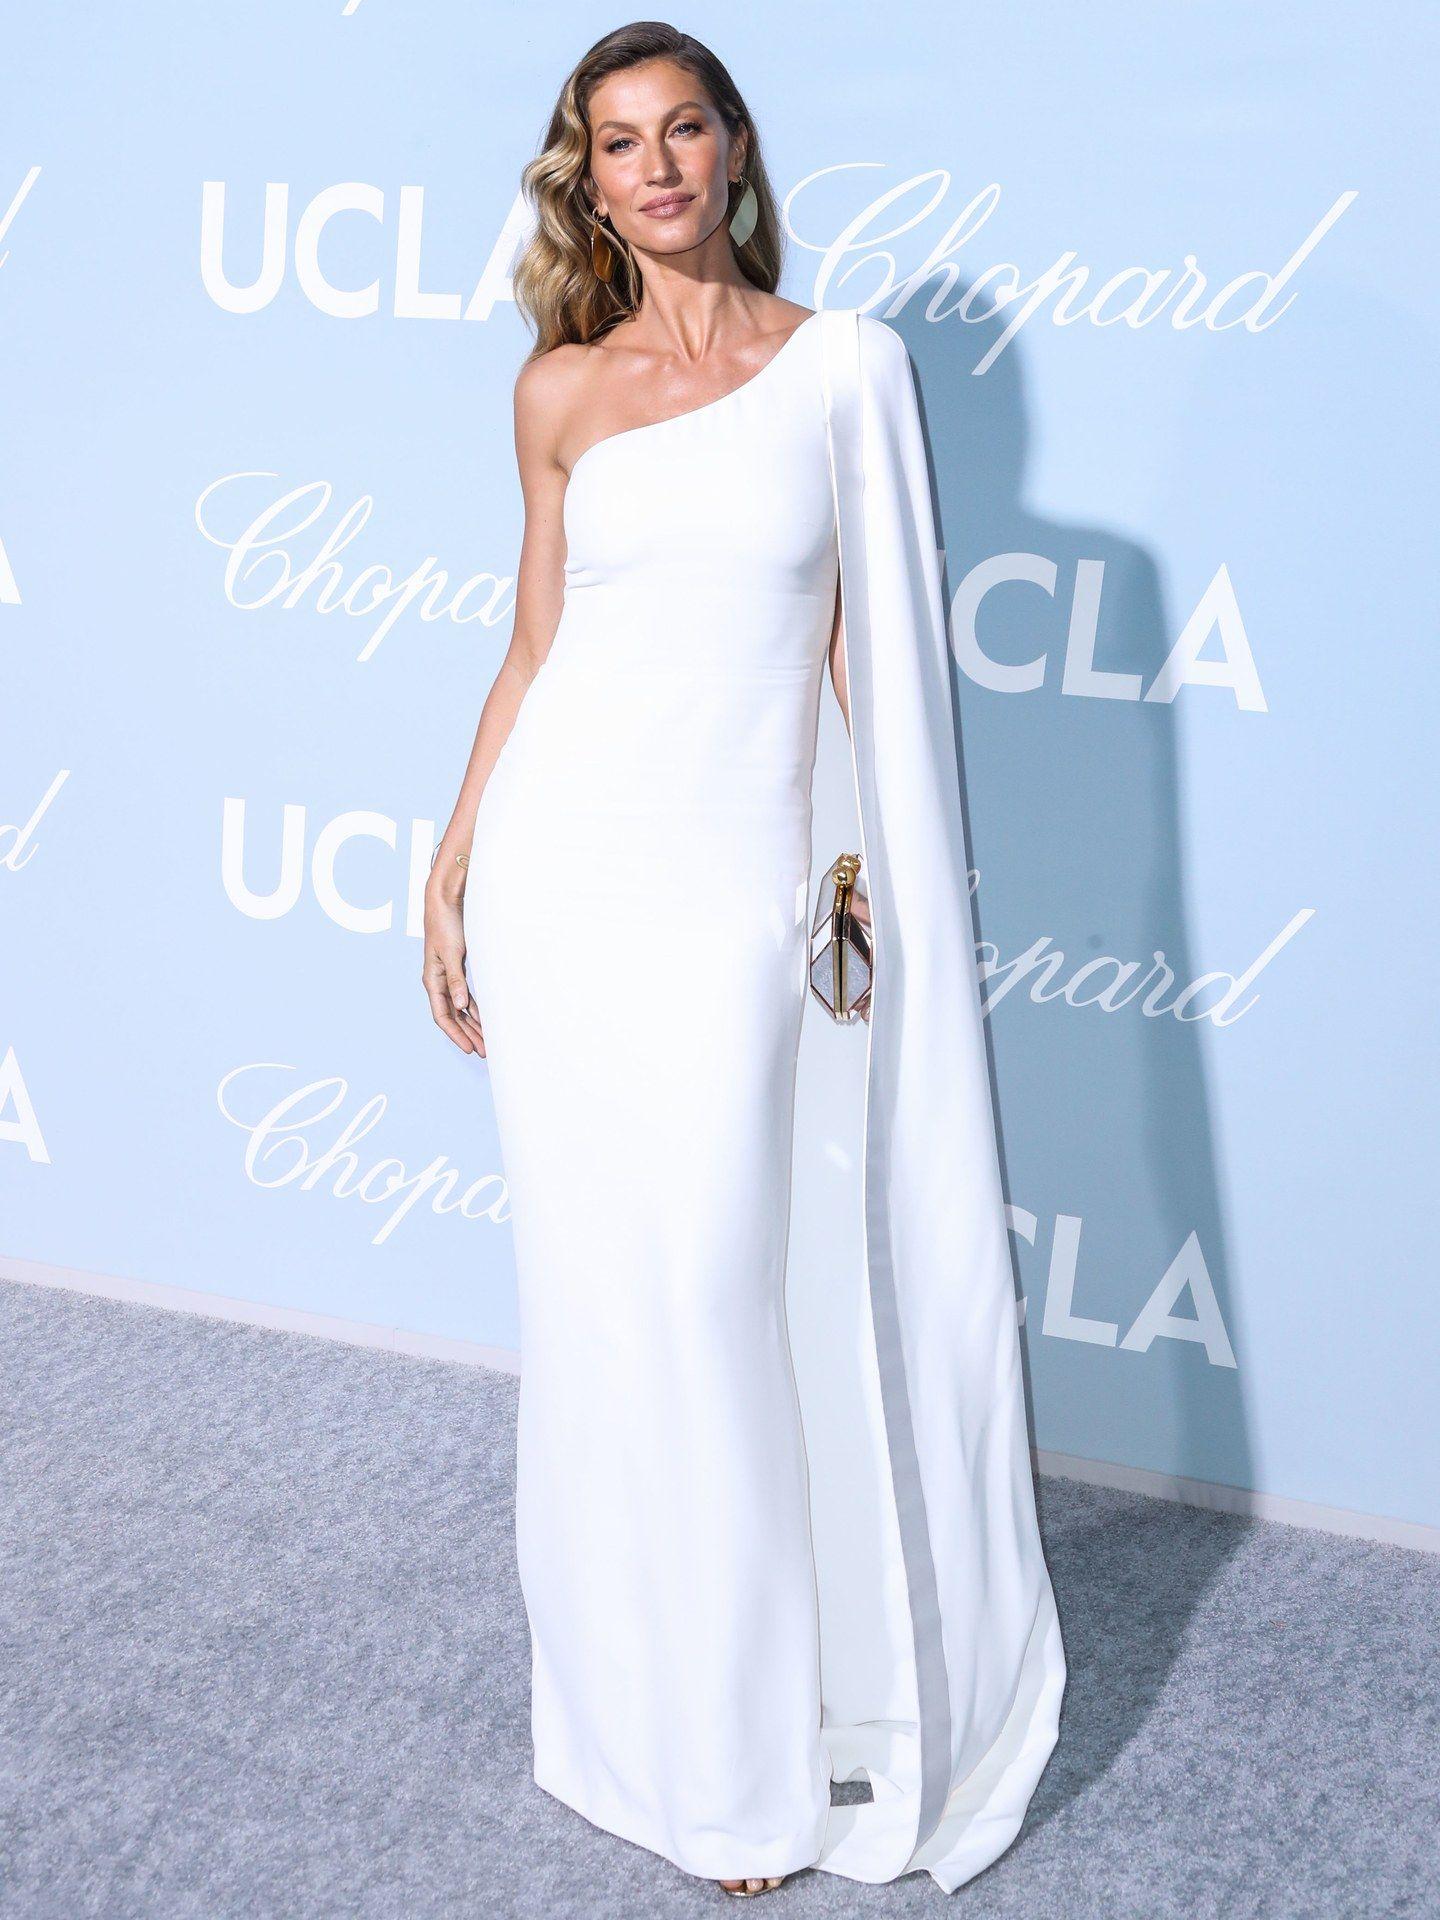 Best Dressed Star I Migliori Look Sfoggiati Dalle Celebrity A Febbraio Stella Mccartney Dresses Nice Dresses One Shoulder White Dress [ 1920 x 1440 Pixel ]